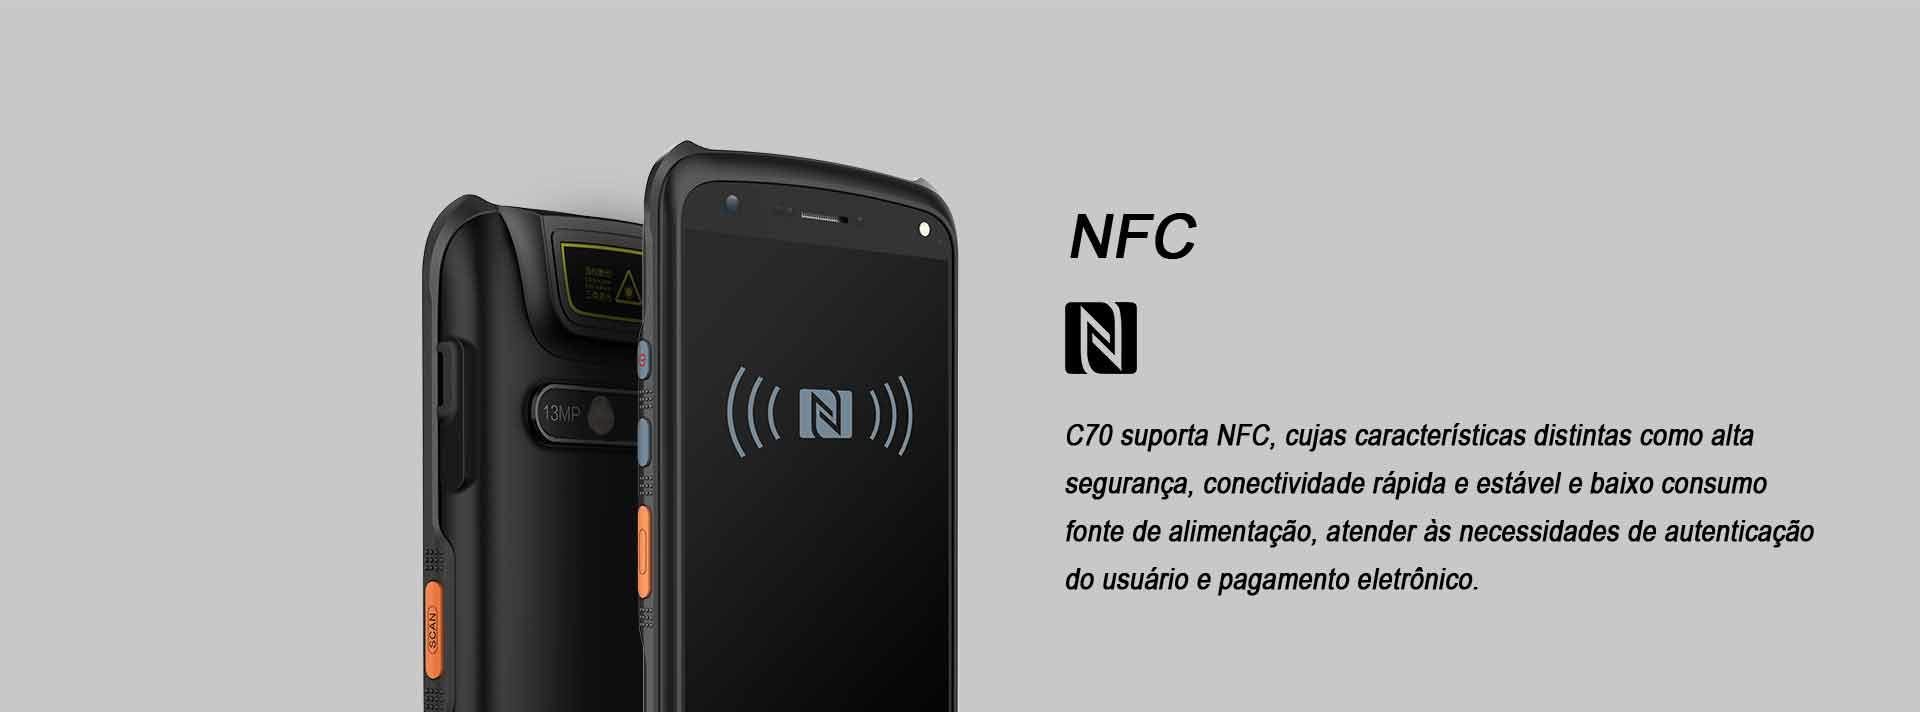 Terminal Móvel C70 Chainway Android NFC